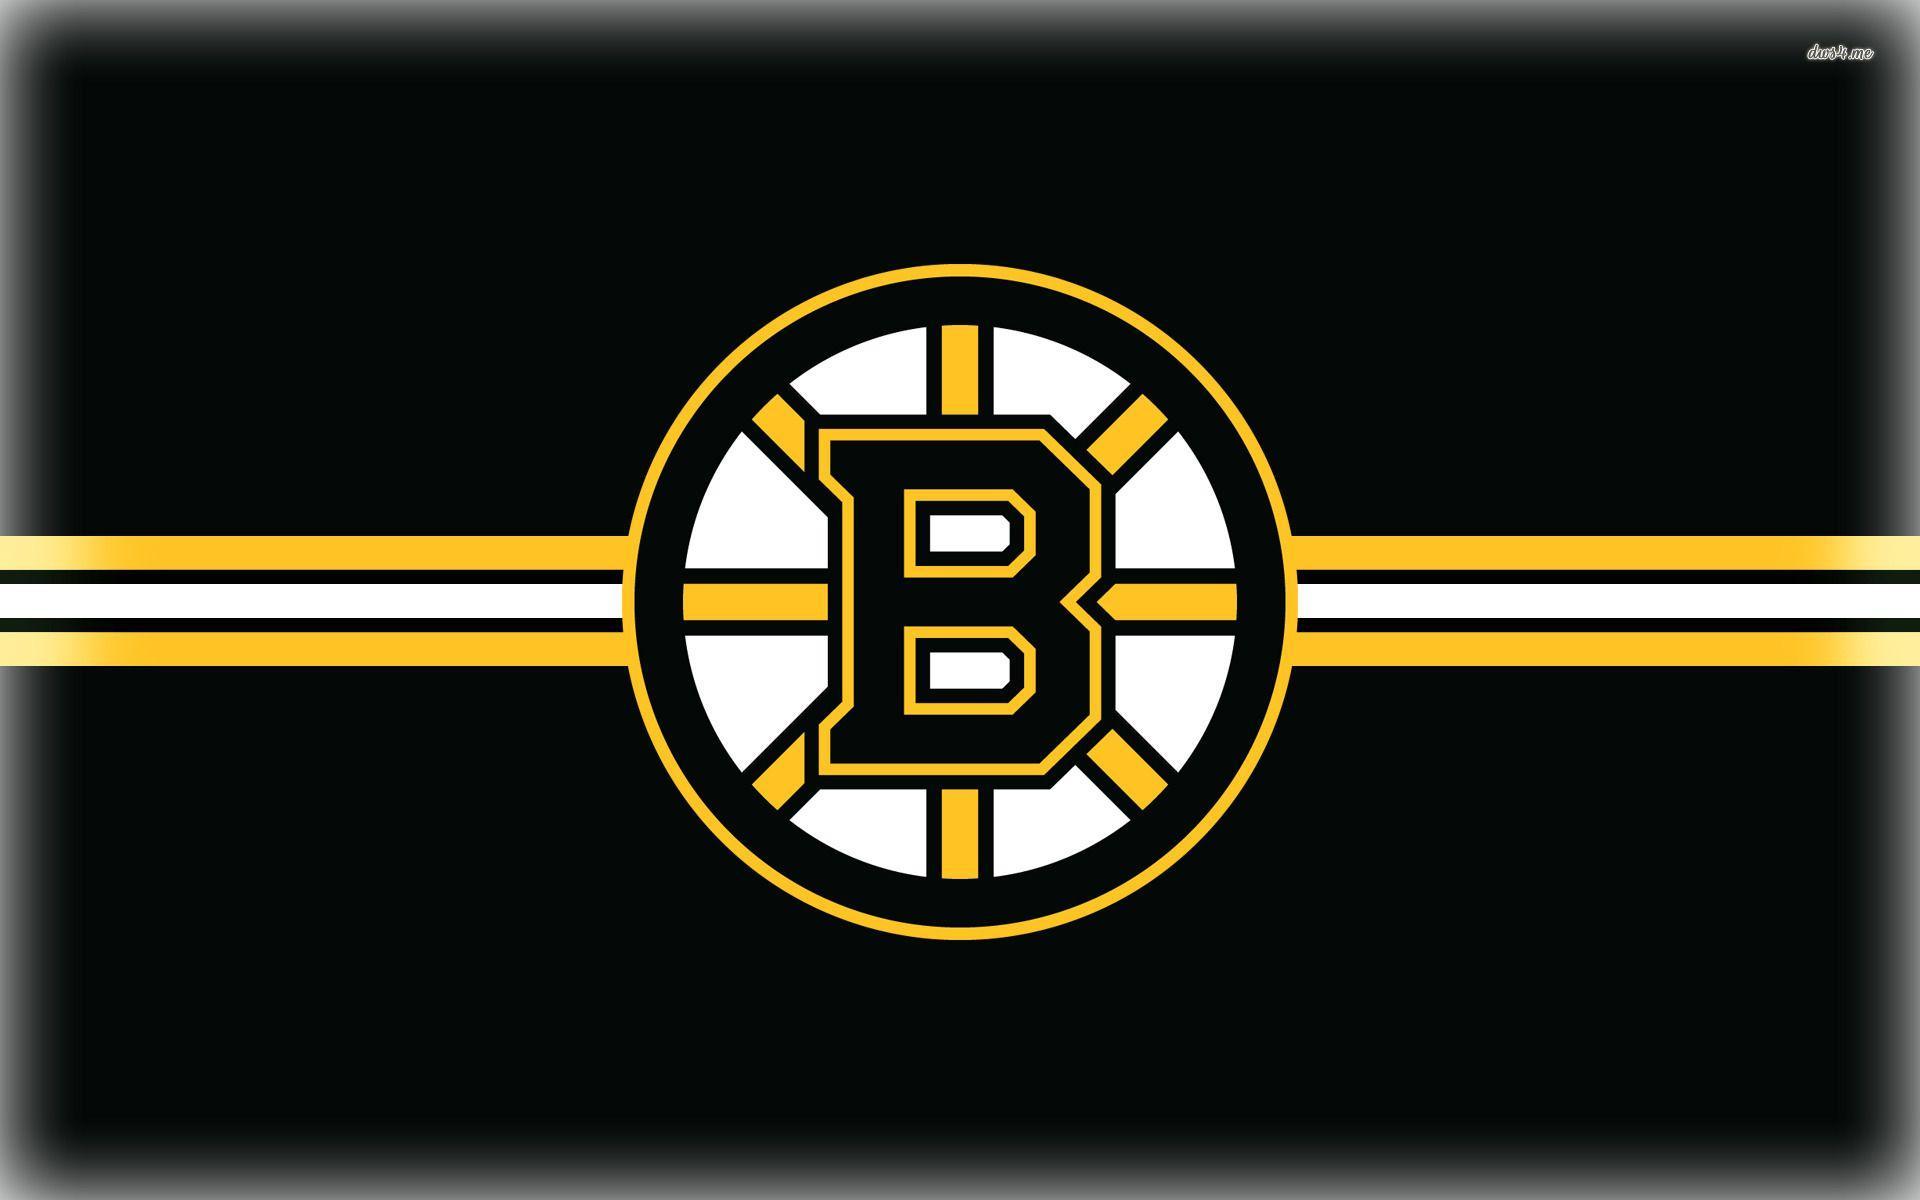 Boston Bruins Wallpapers - Top Free Boston Bruins Backgrounds -  WallpaperAccess